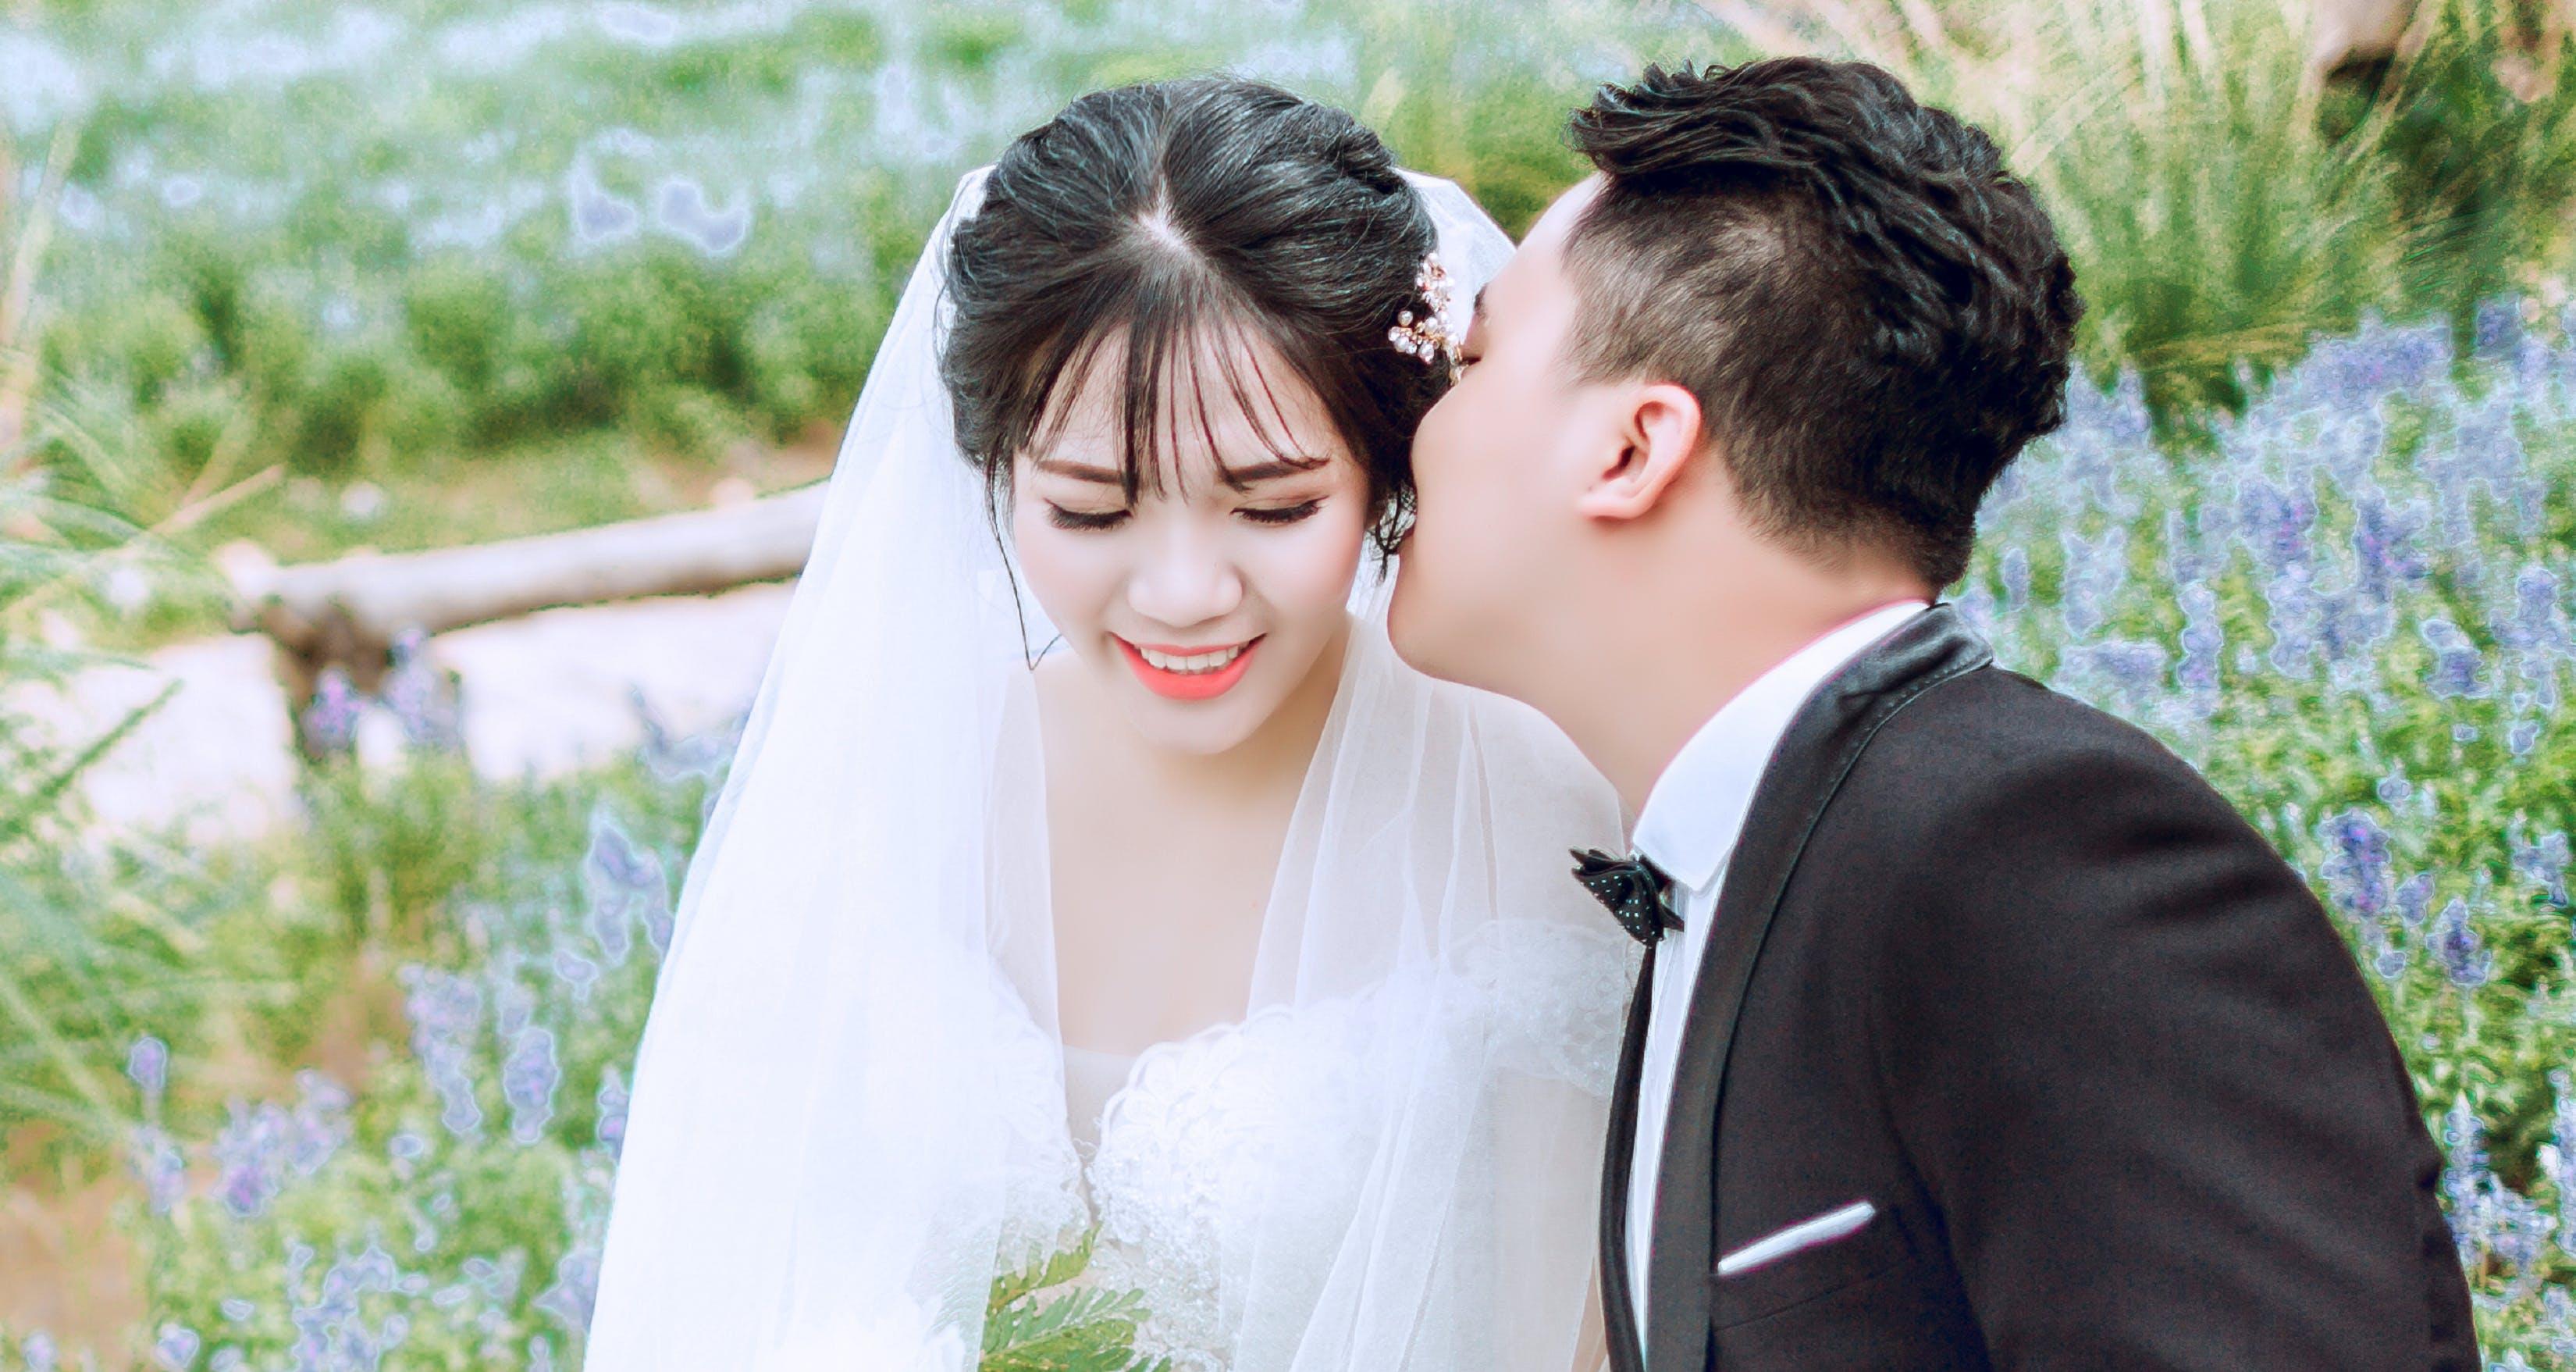 Kostenloses Stock Foto zu braut und bräutigam, bräutigam, fashion, fotoshooting